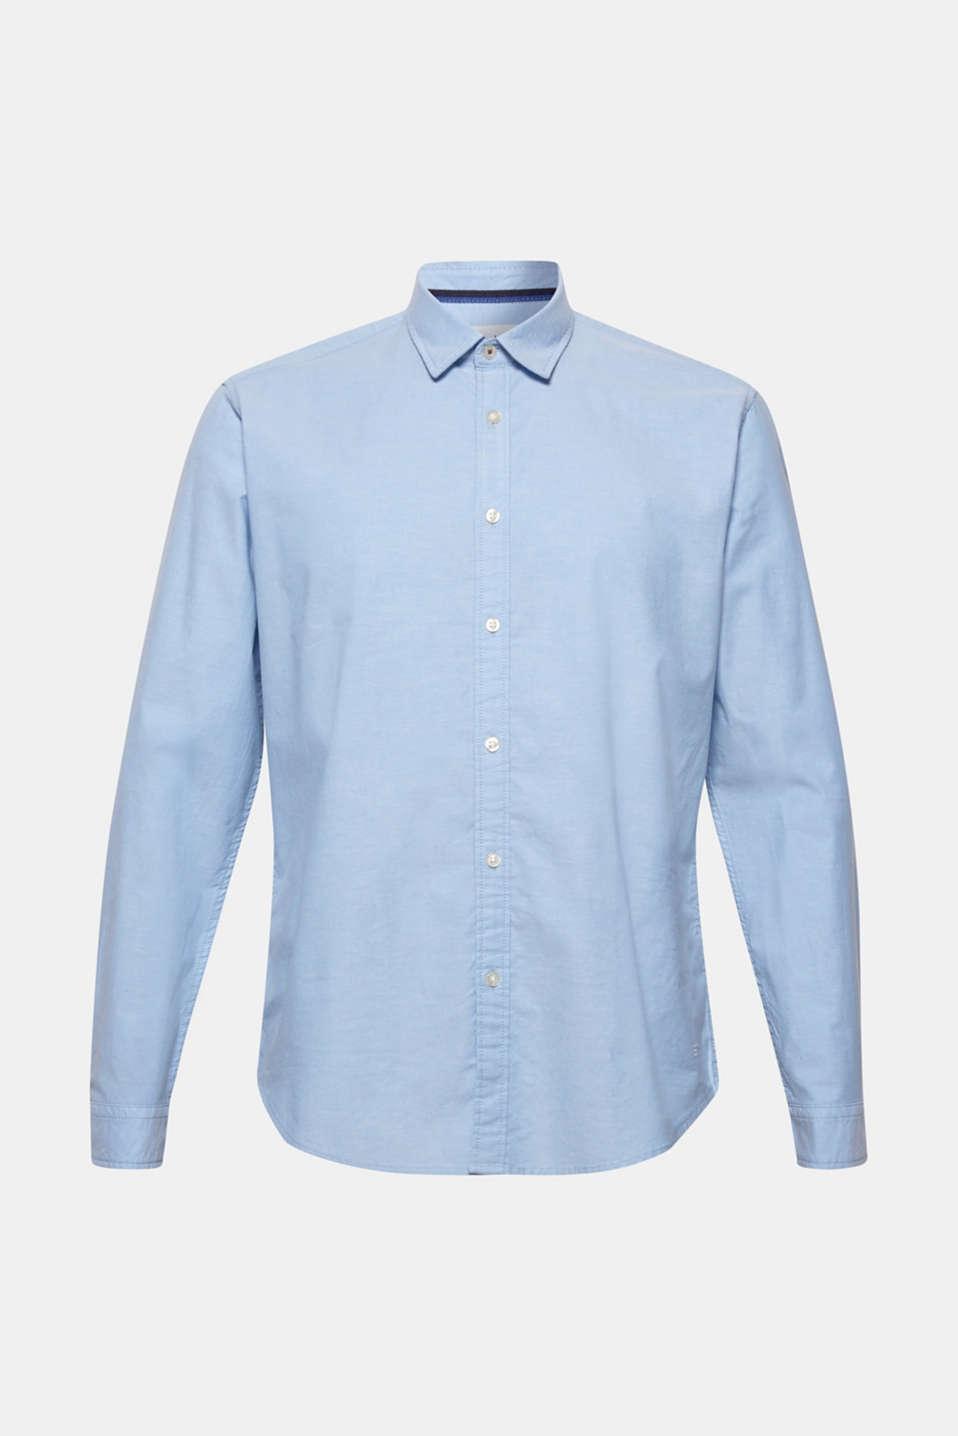 Shirts woven Slim fit, LIGHT BLUE, detail image number 6